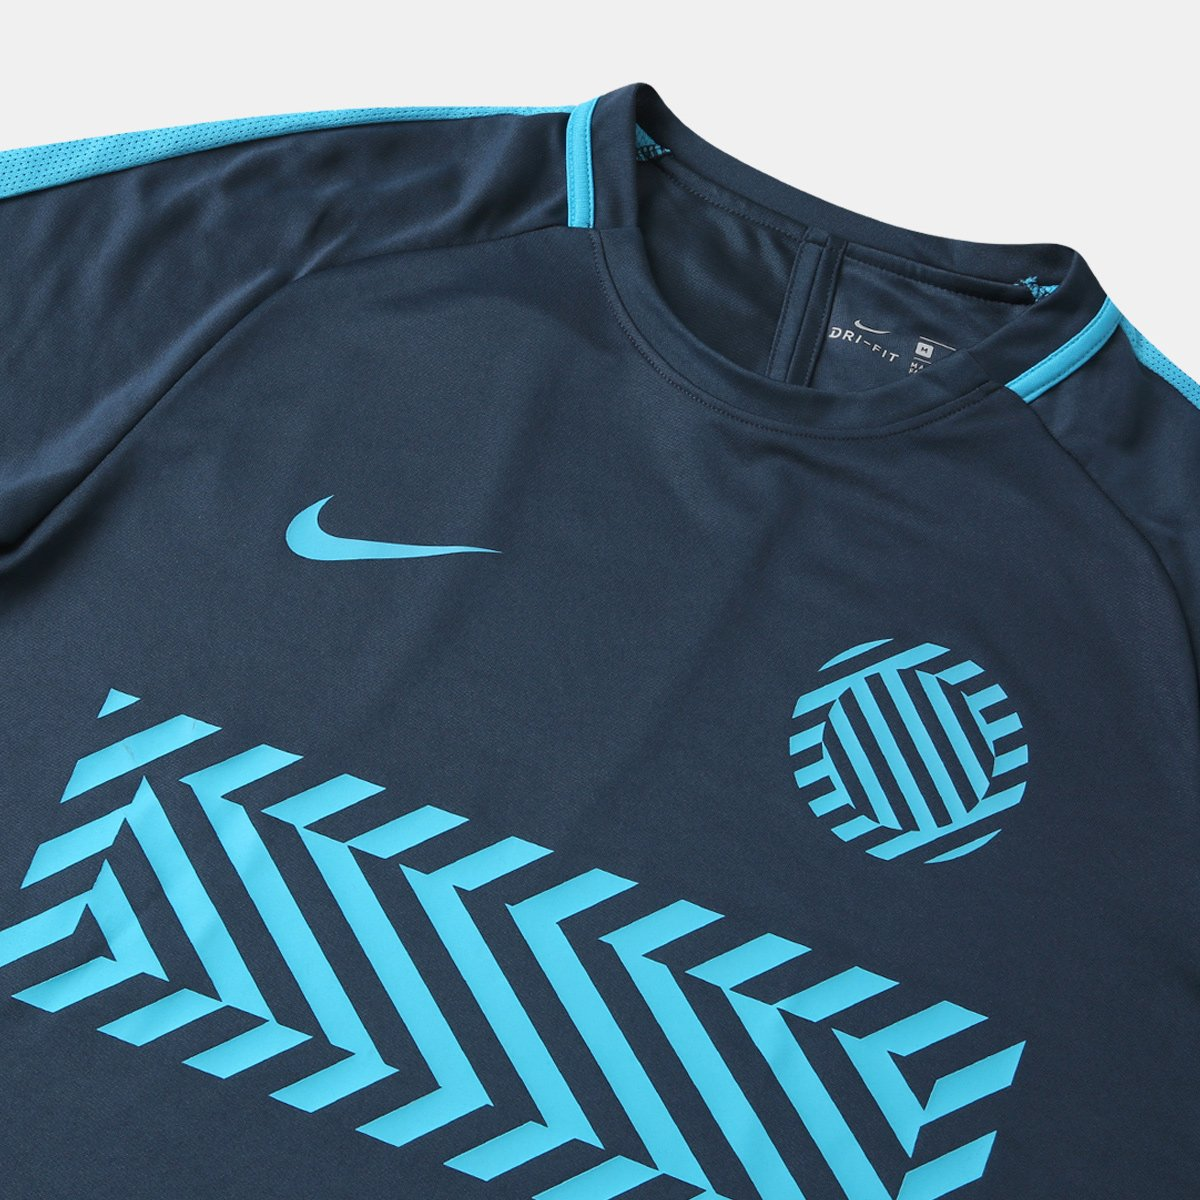 Camisa Nike Dry Academy GX2 Masculina - Compre Agora  3f4f25a8f1798